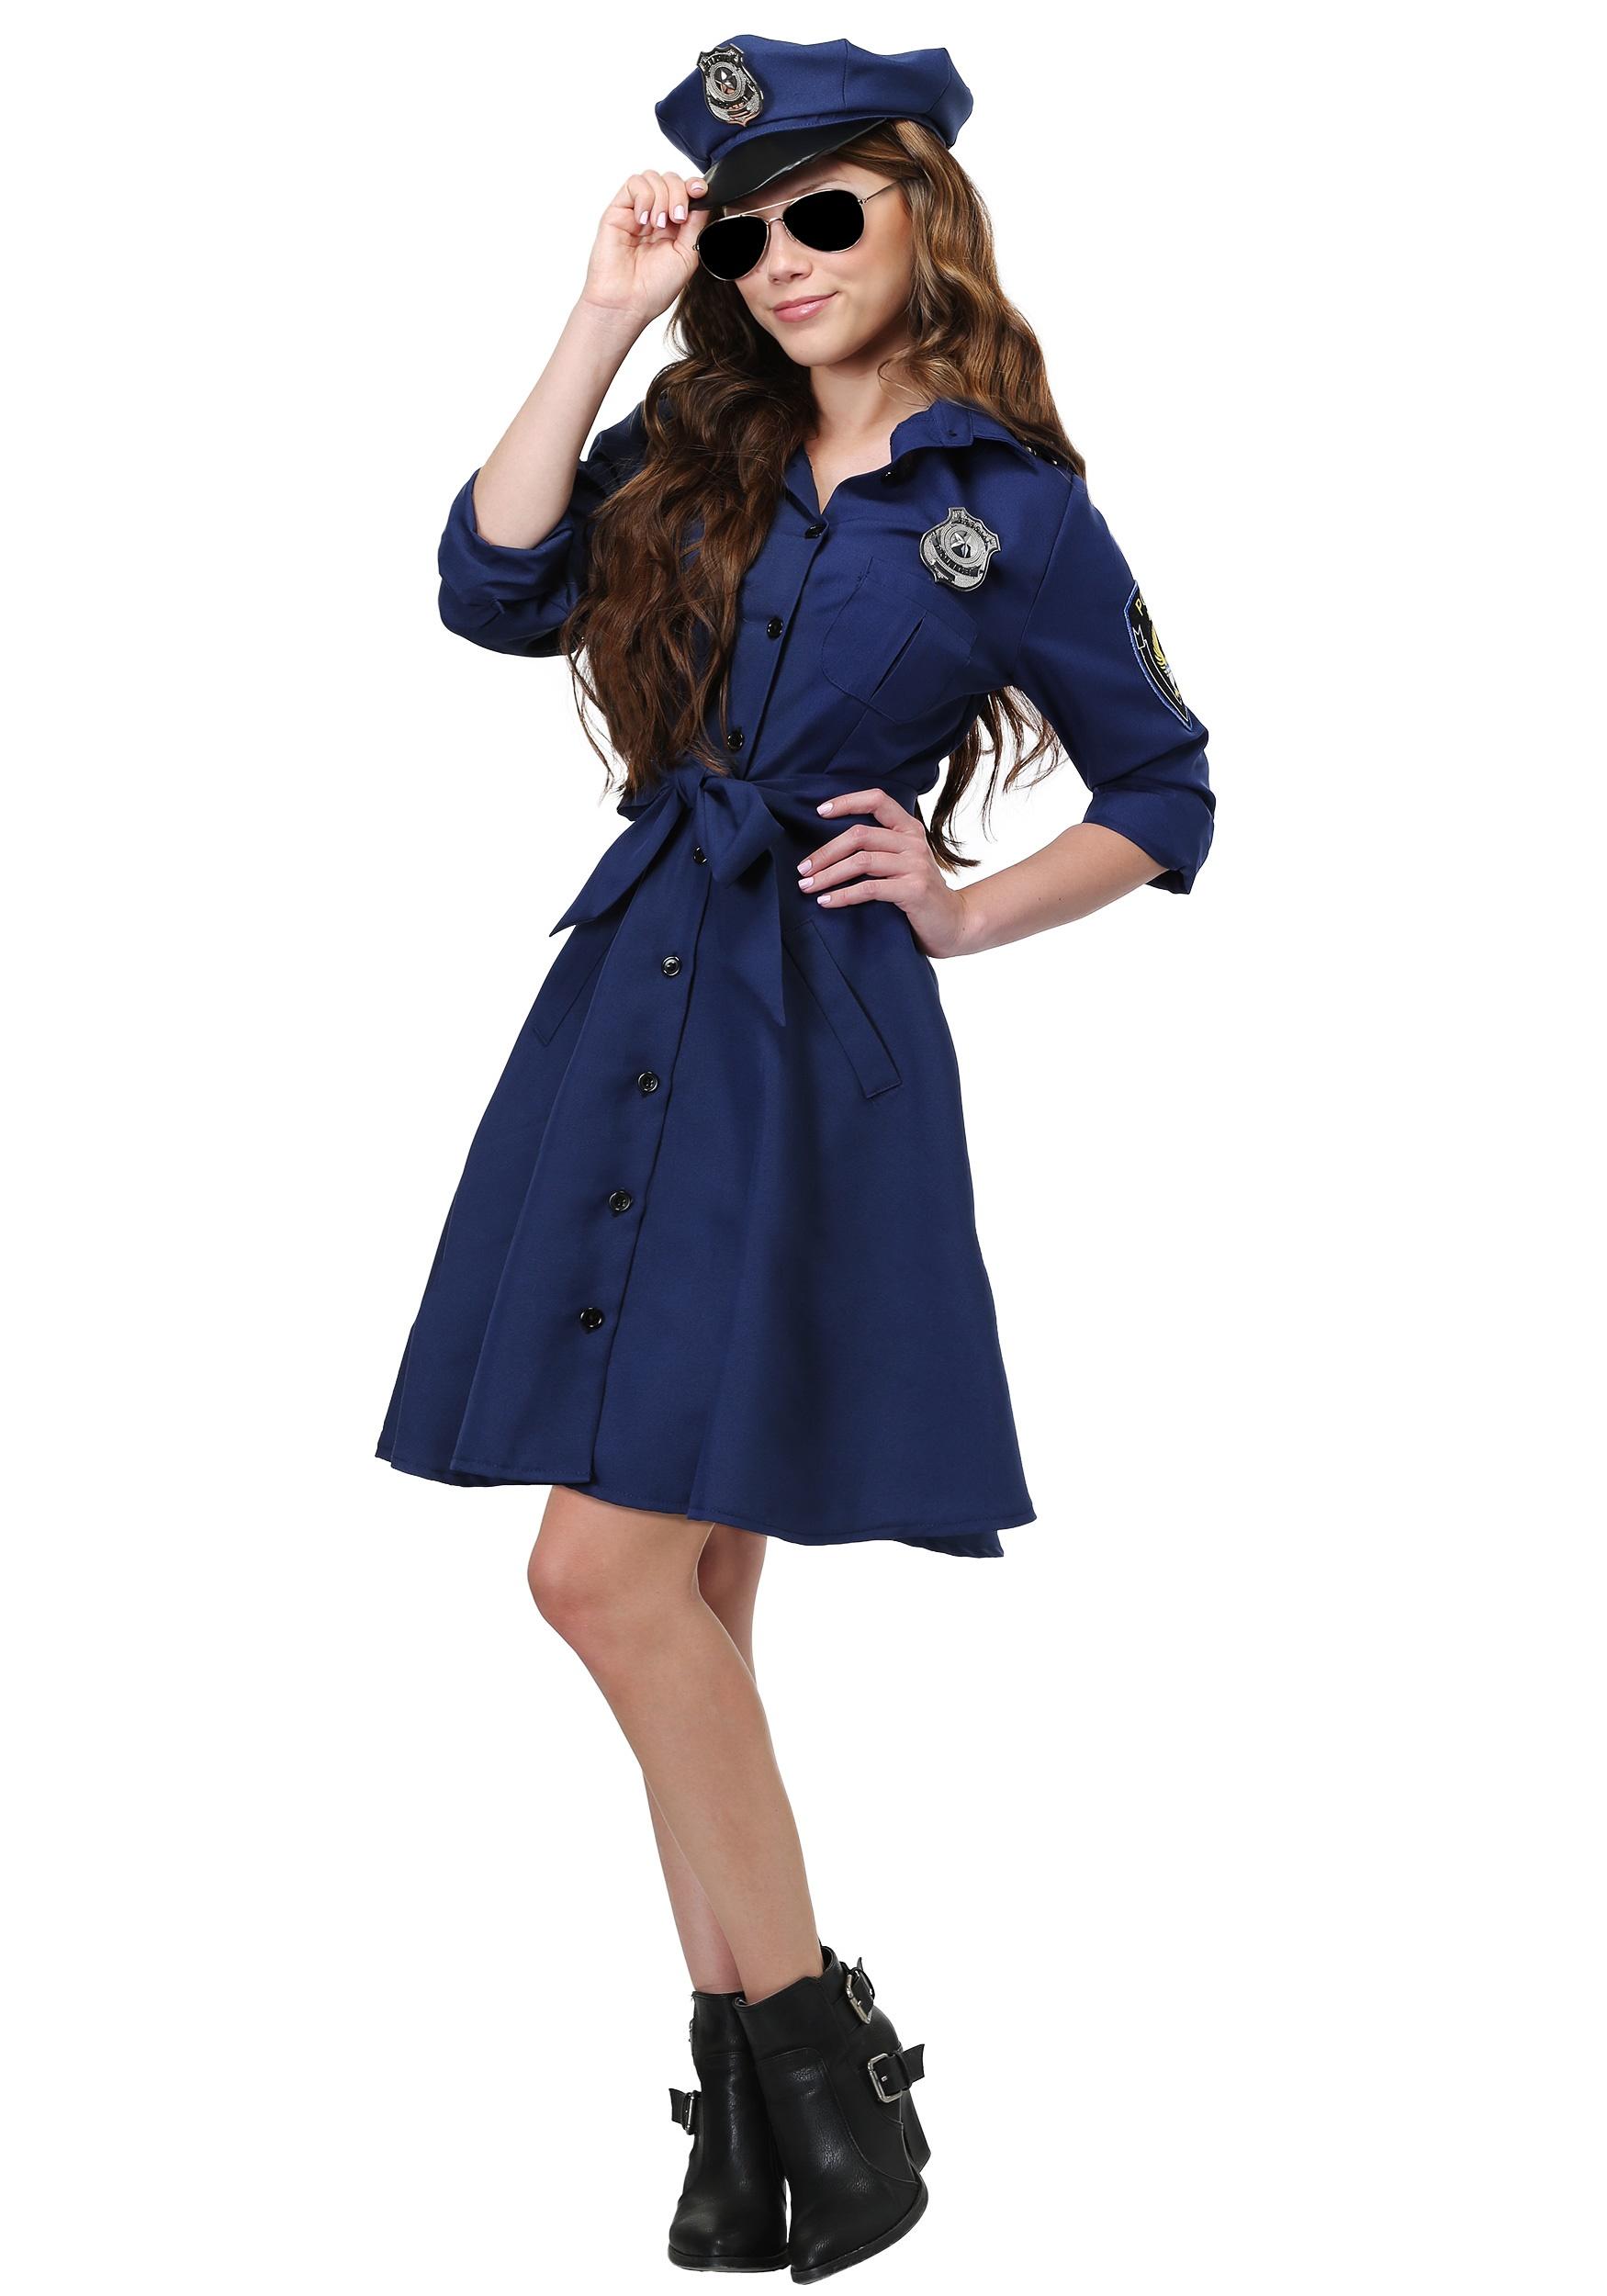 Flirty Cop Plus Size Costume for Women 1X 2X